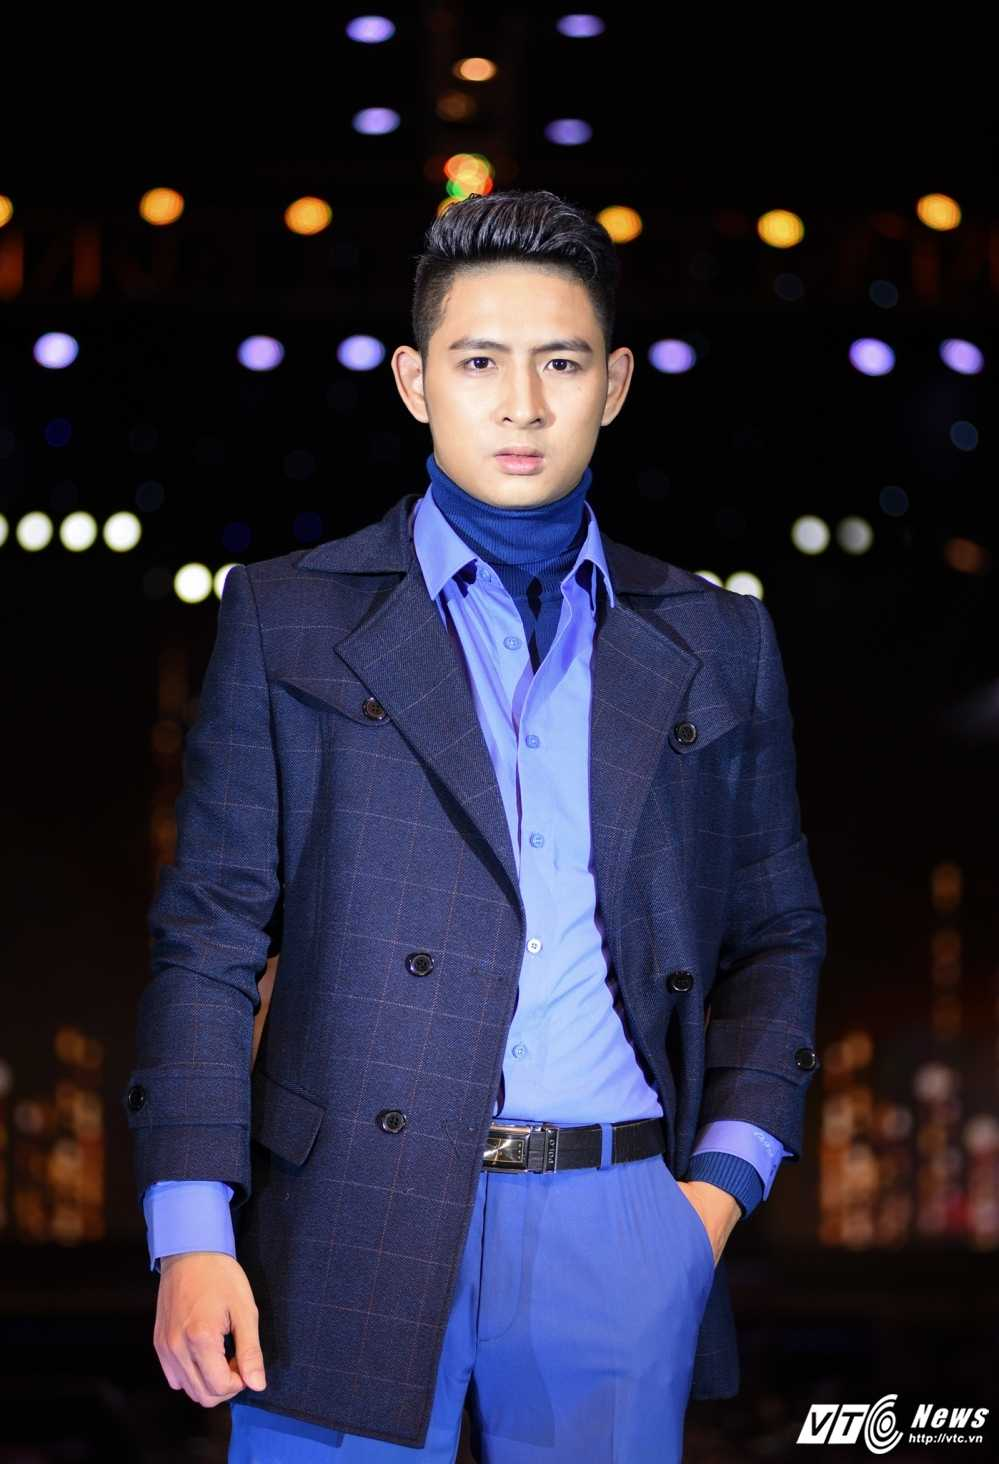 Dem thoi trang Phan Nguyen: Phong cach tre trung lich lam len ngoi hinh anh 7